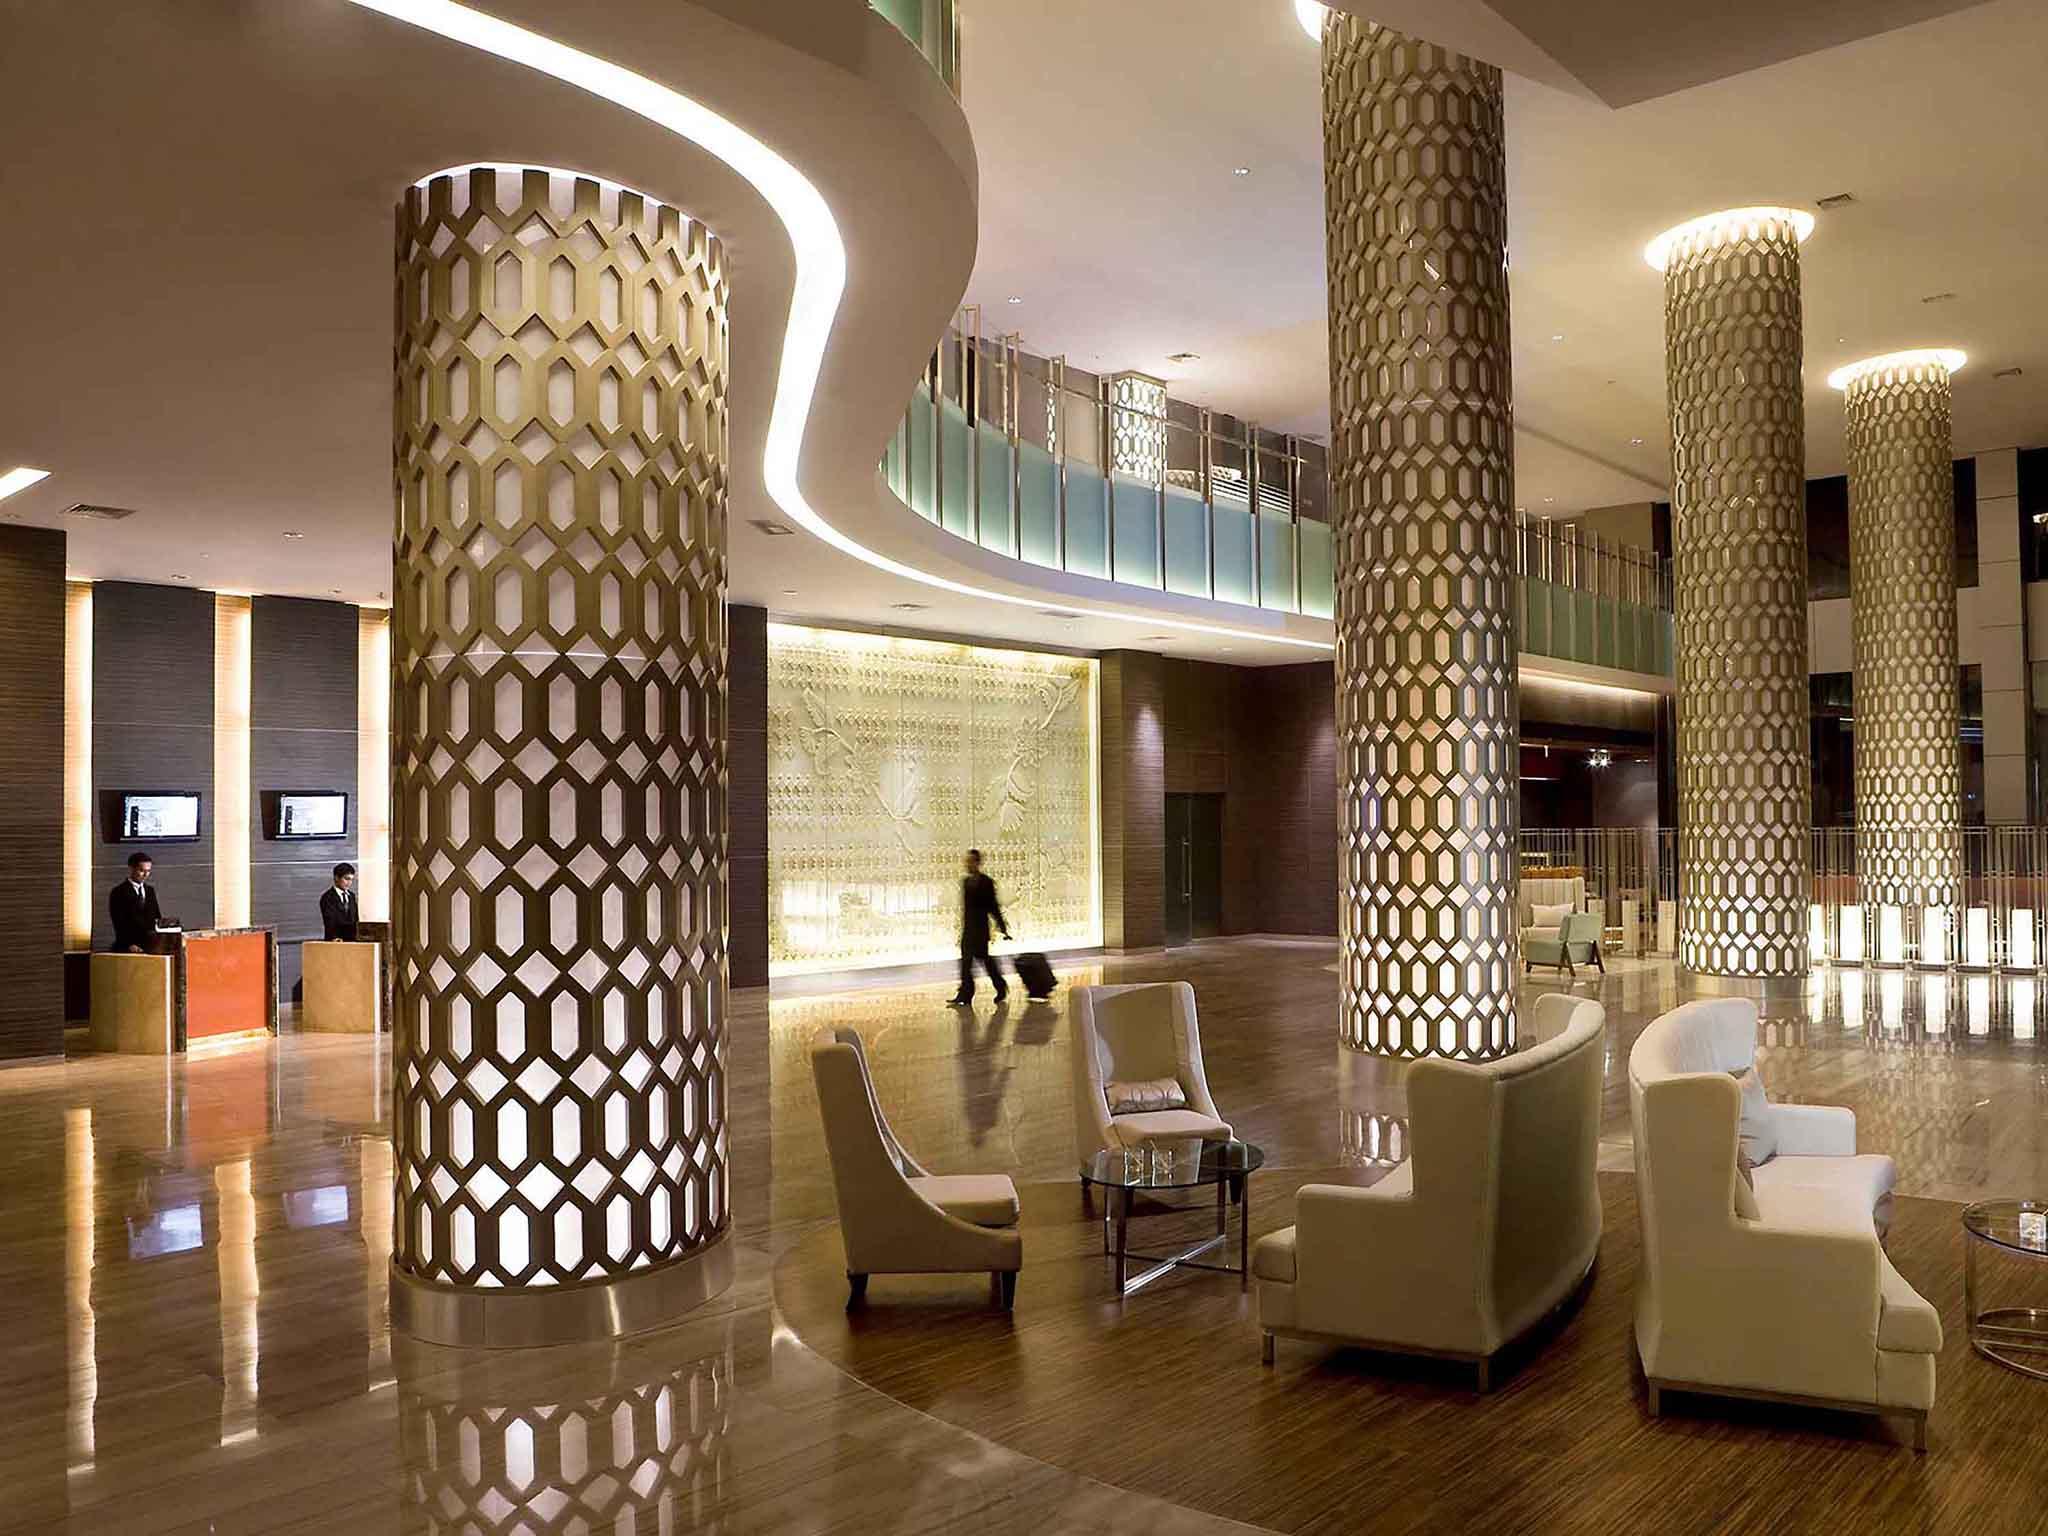 Hotell – Novotel Bangka - Hotel & Convention Centre